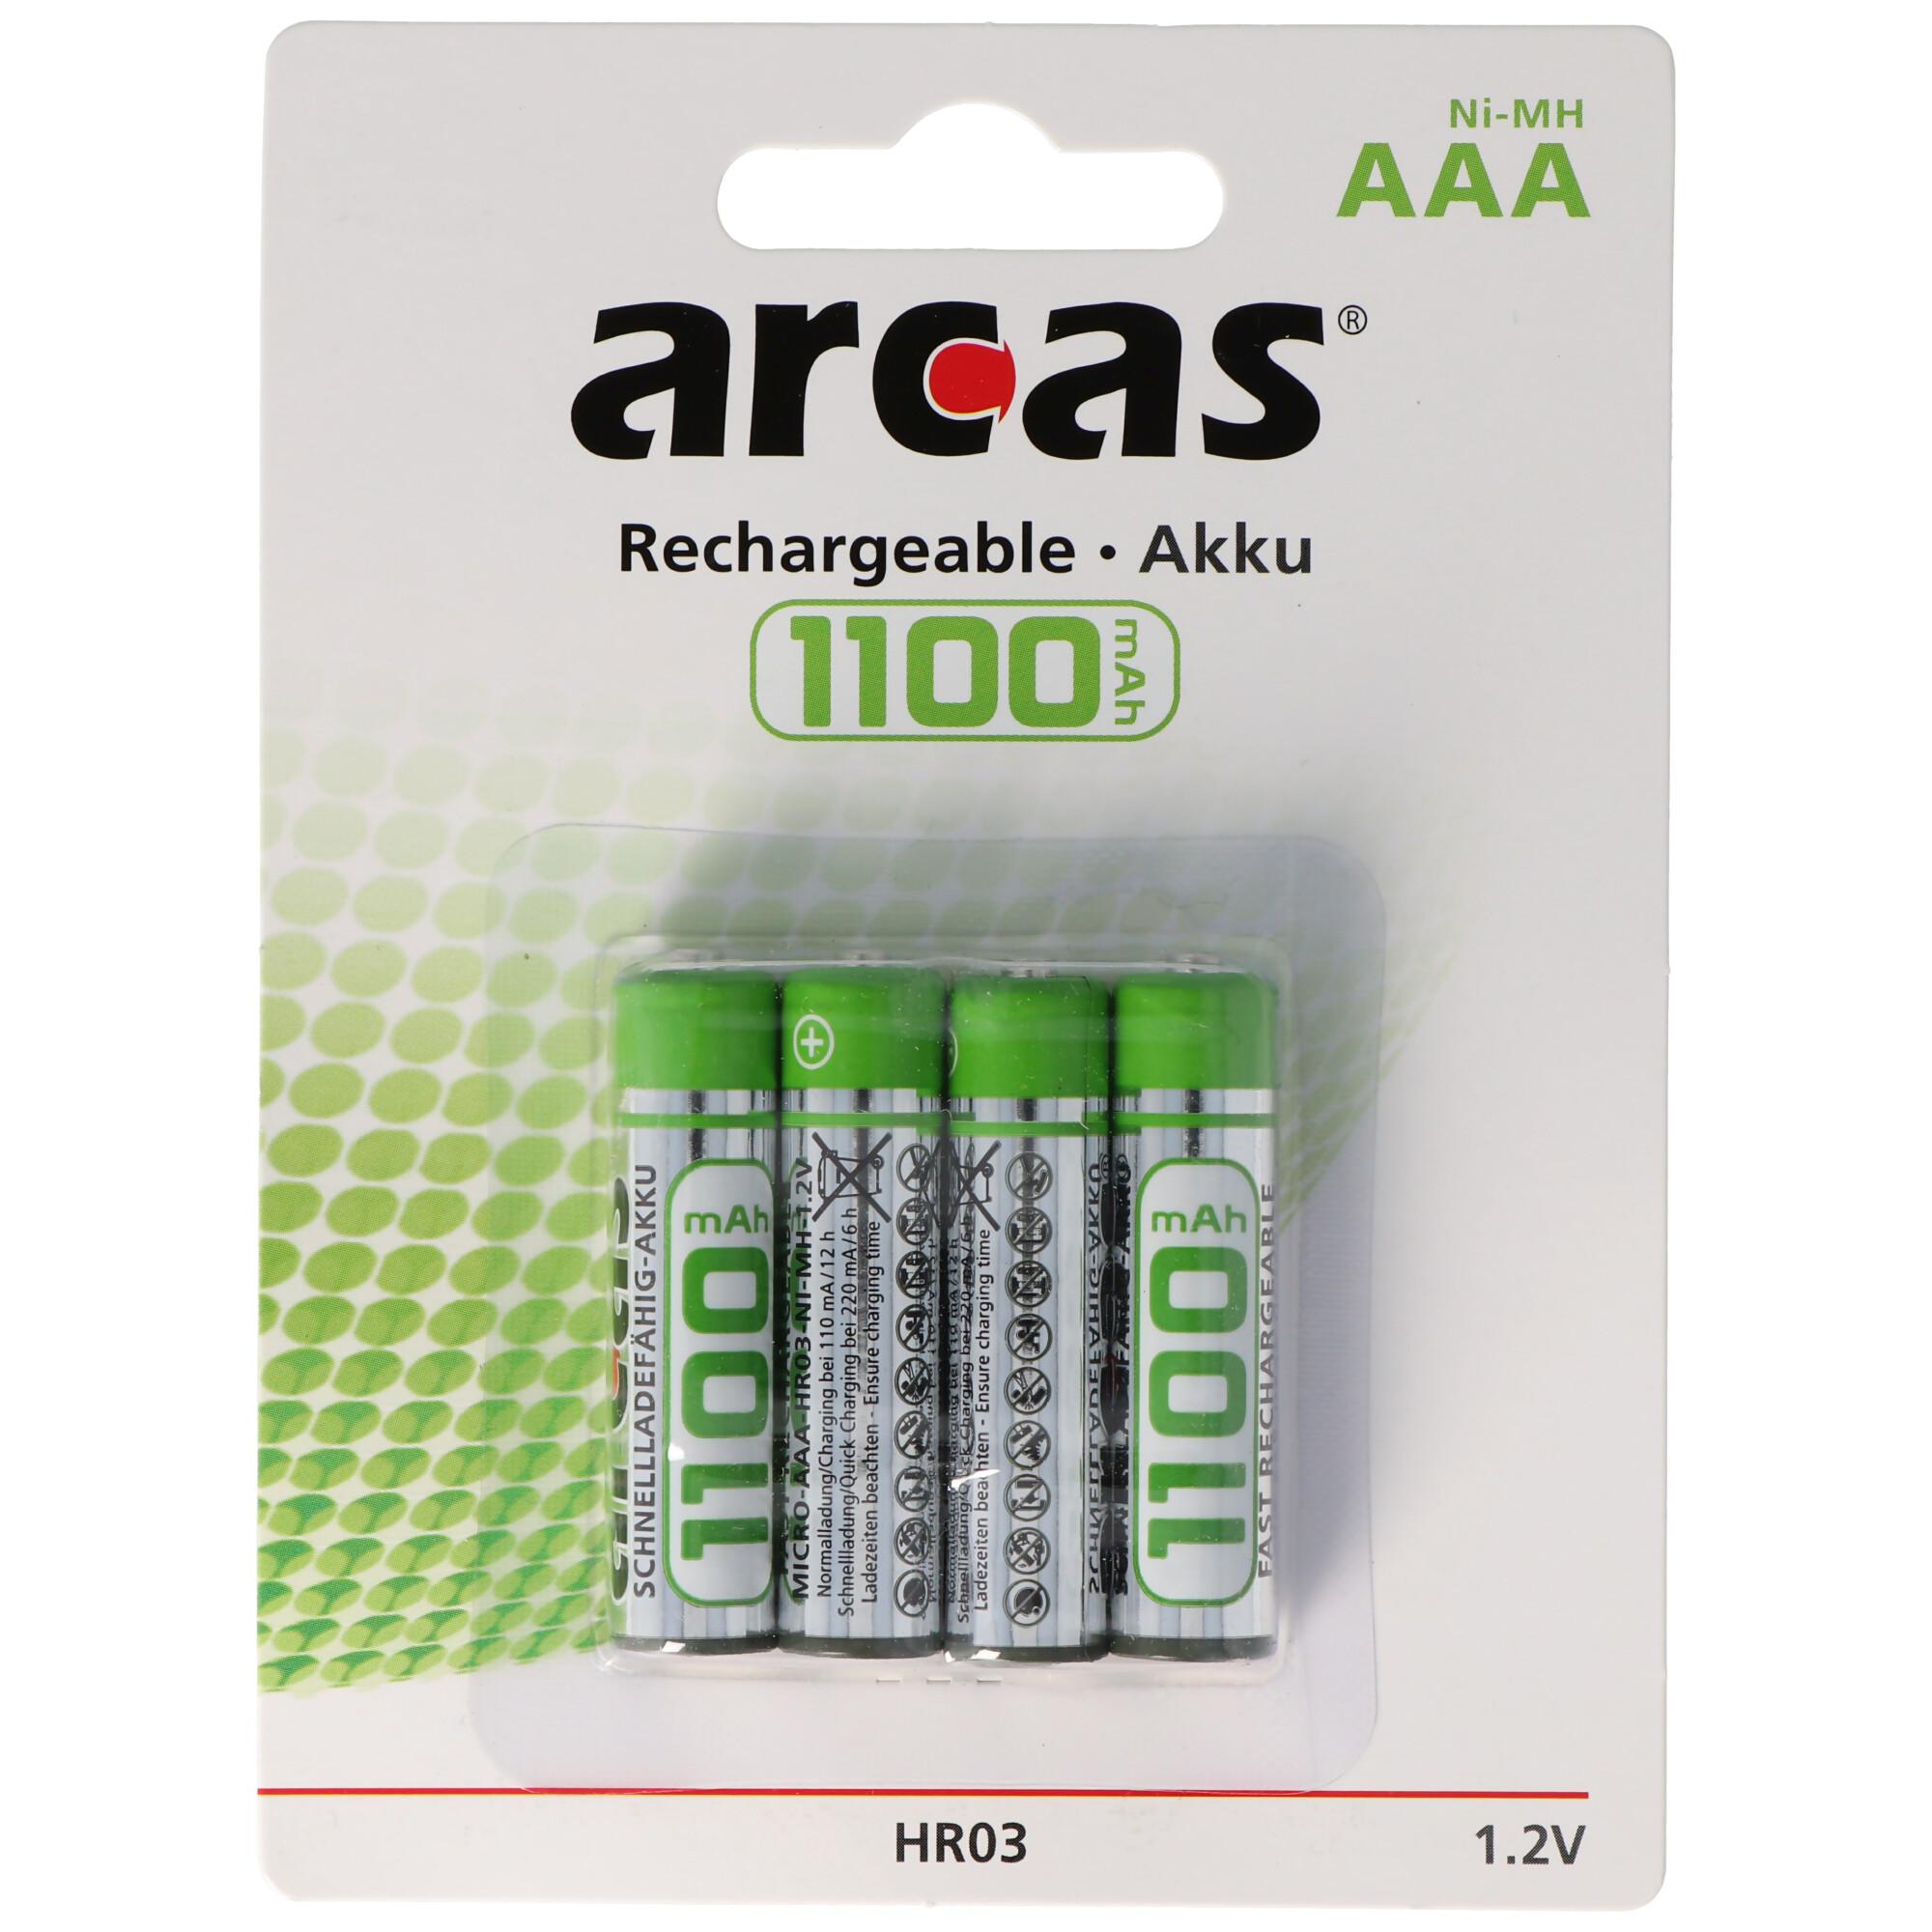 8 x Arcas 1100mAh NiMh Akku Accu AAA Micro HR03 1,2V DECT Telefon